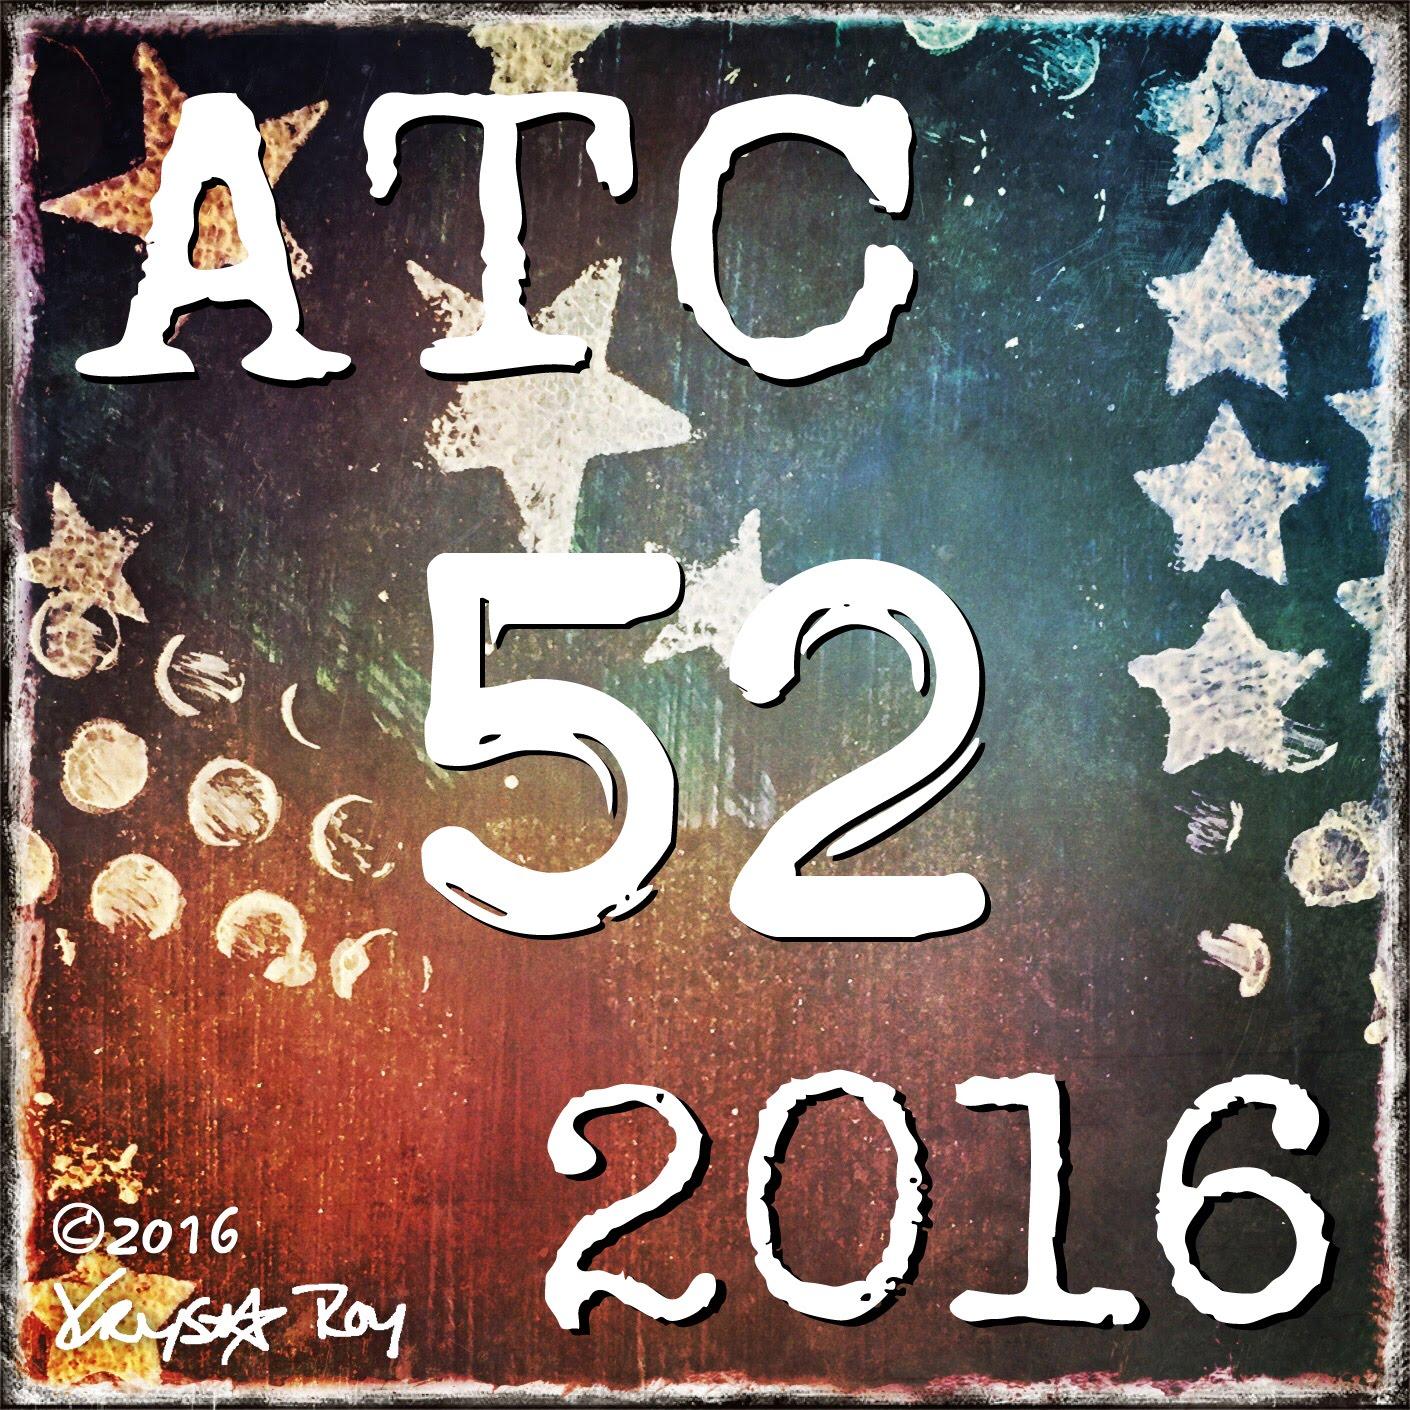 ATC 52 2016